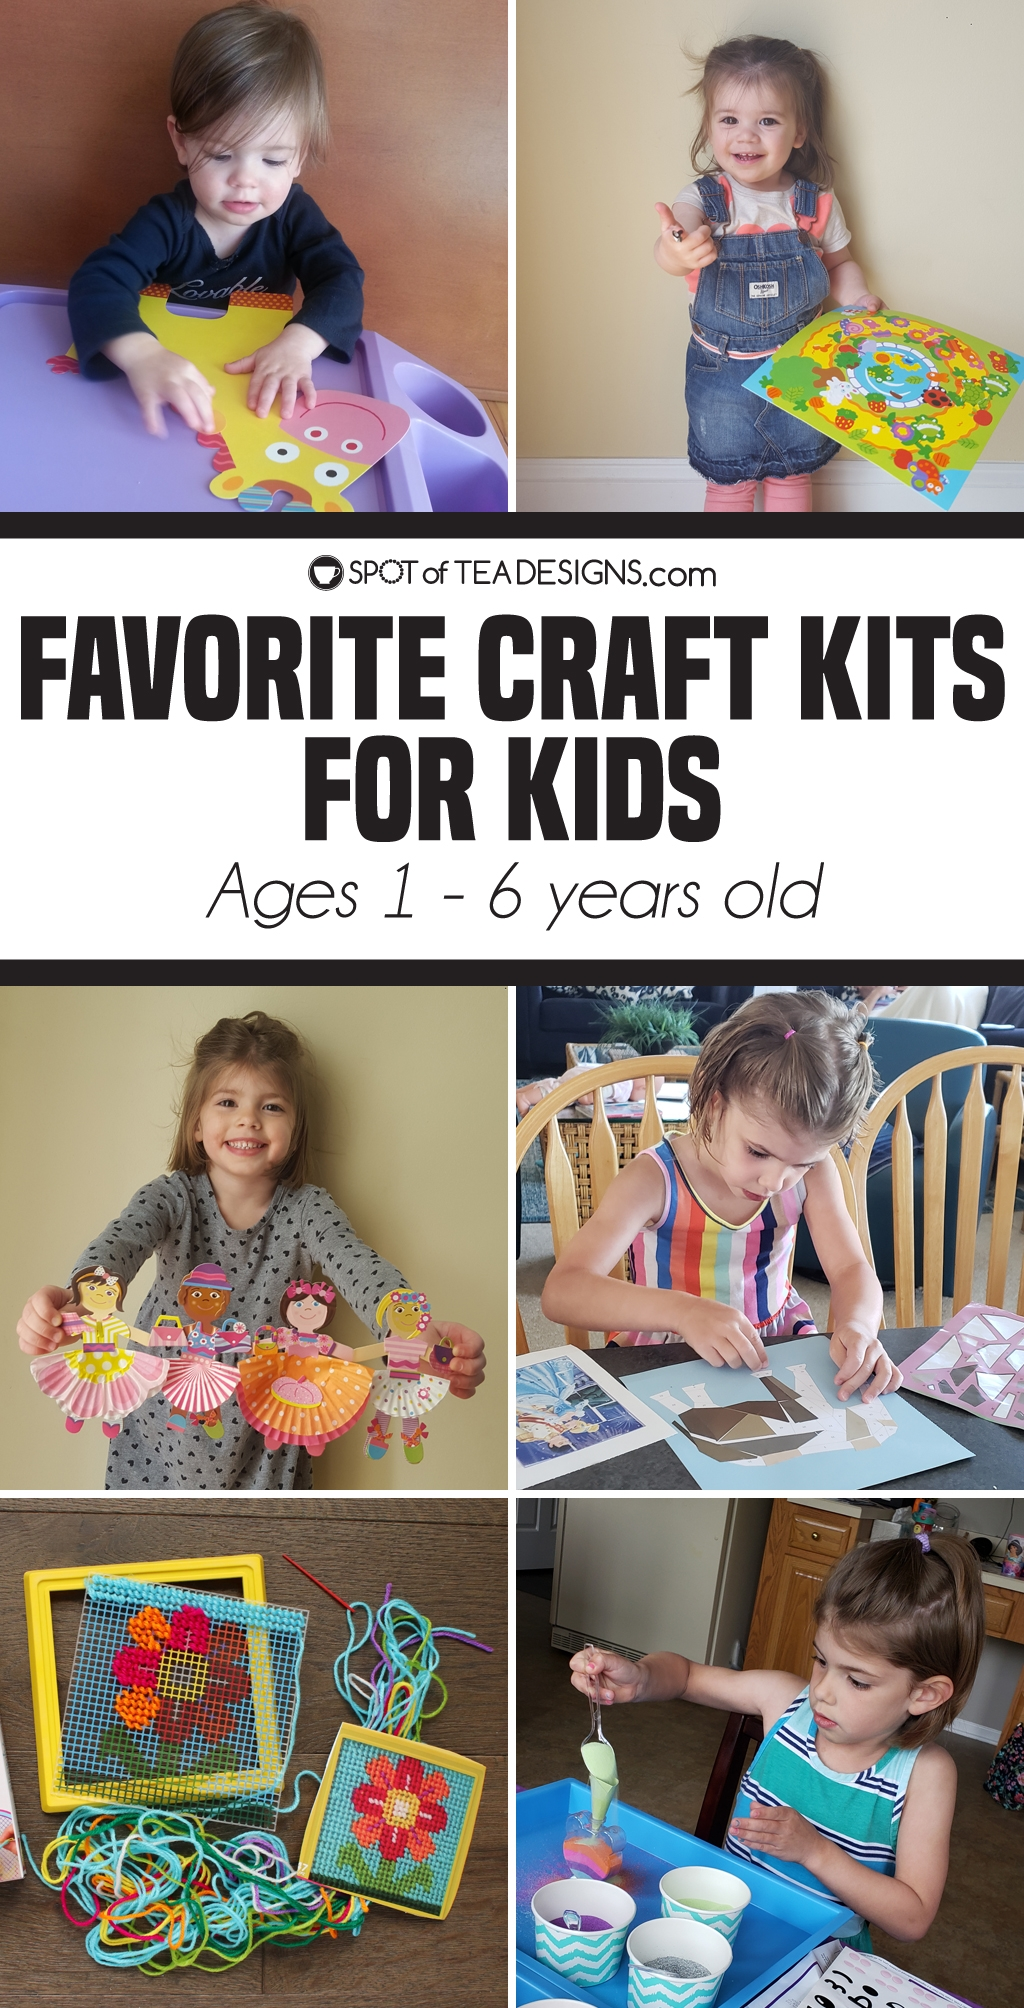 Favorite craft kits for kids ages 1 - 6   spotofteadesigns.com